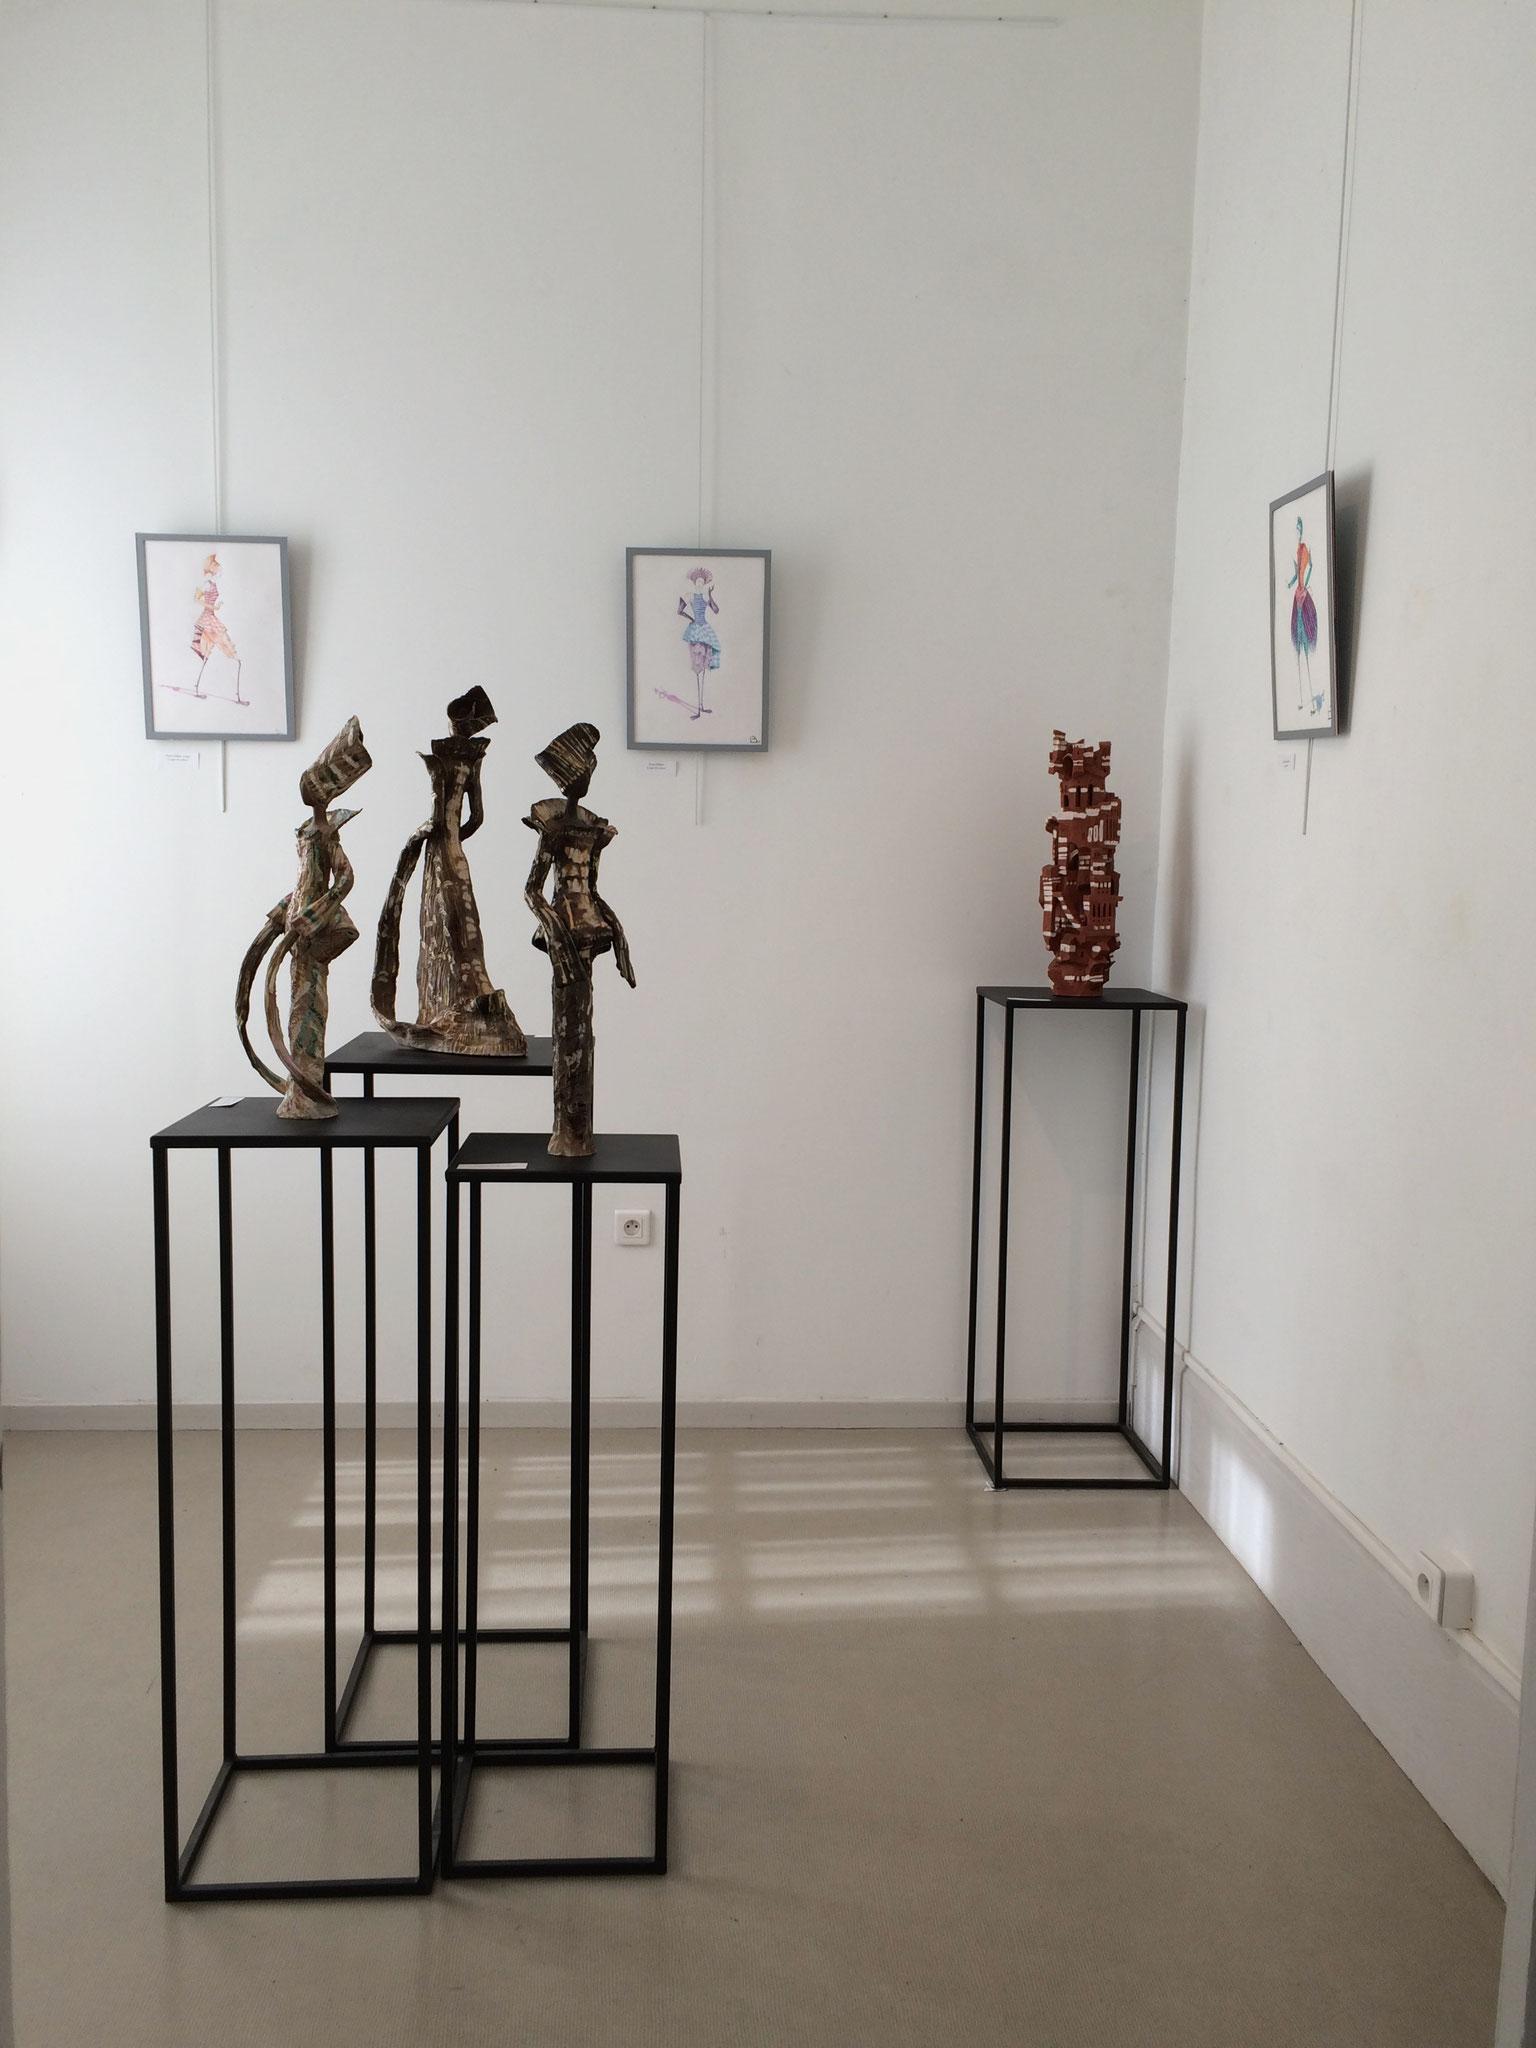 exposition avril 2019 Maison du gardien Valence